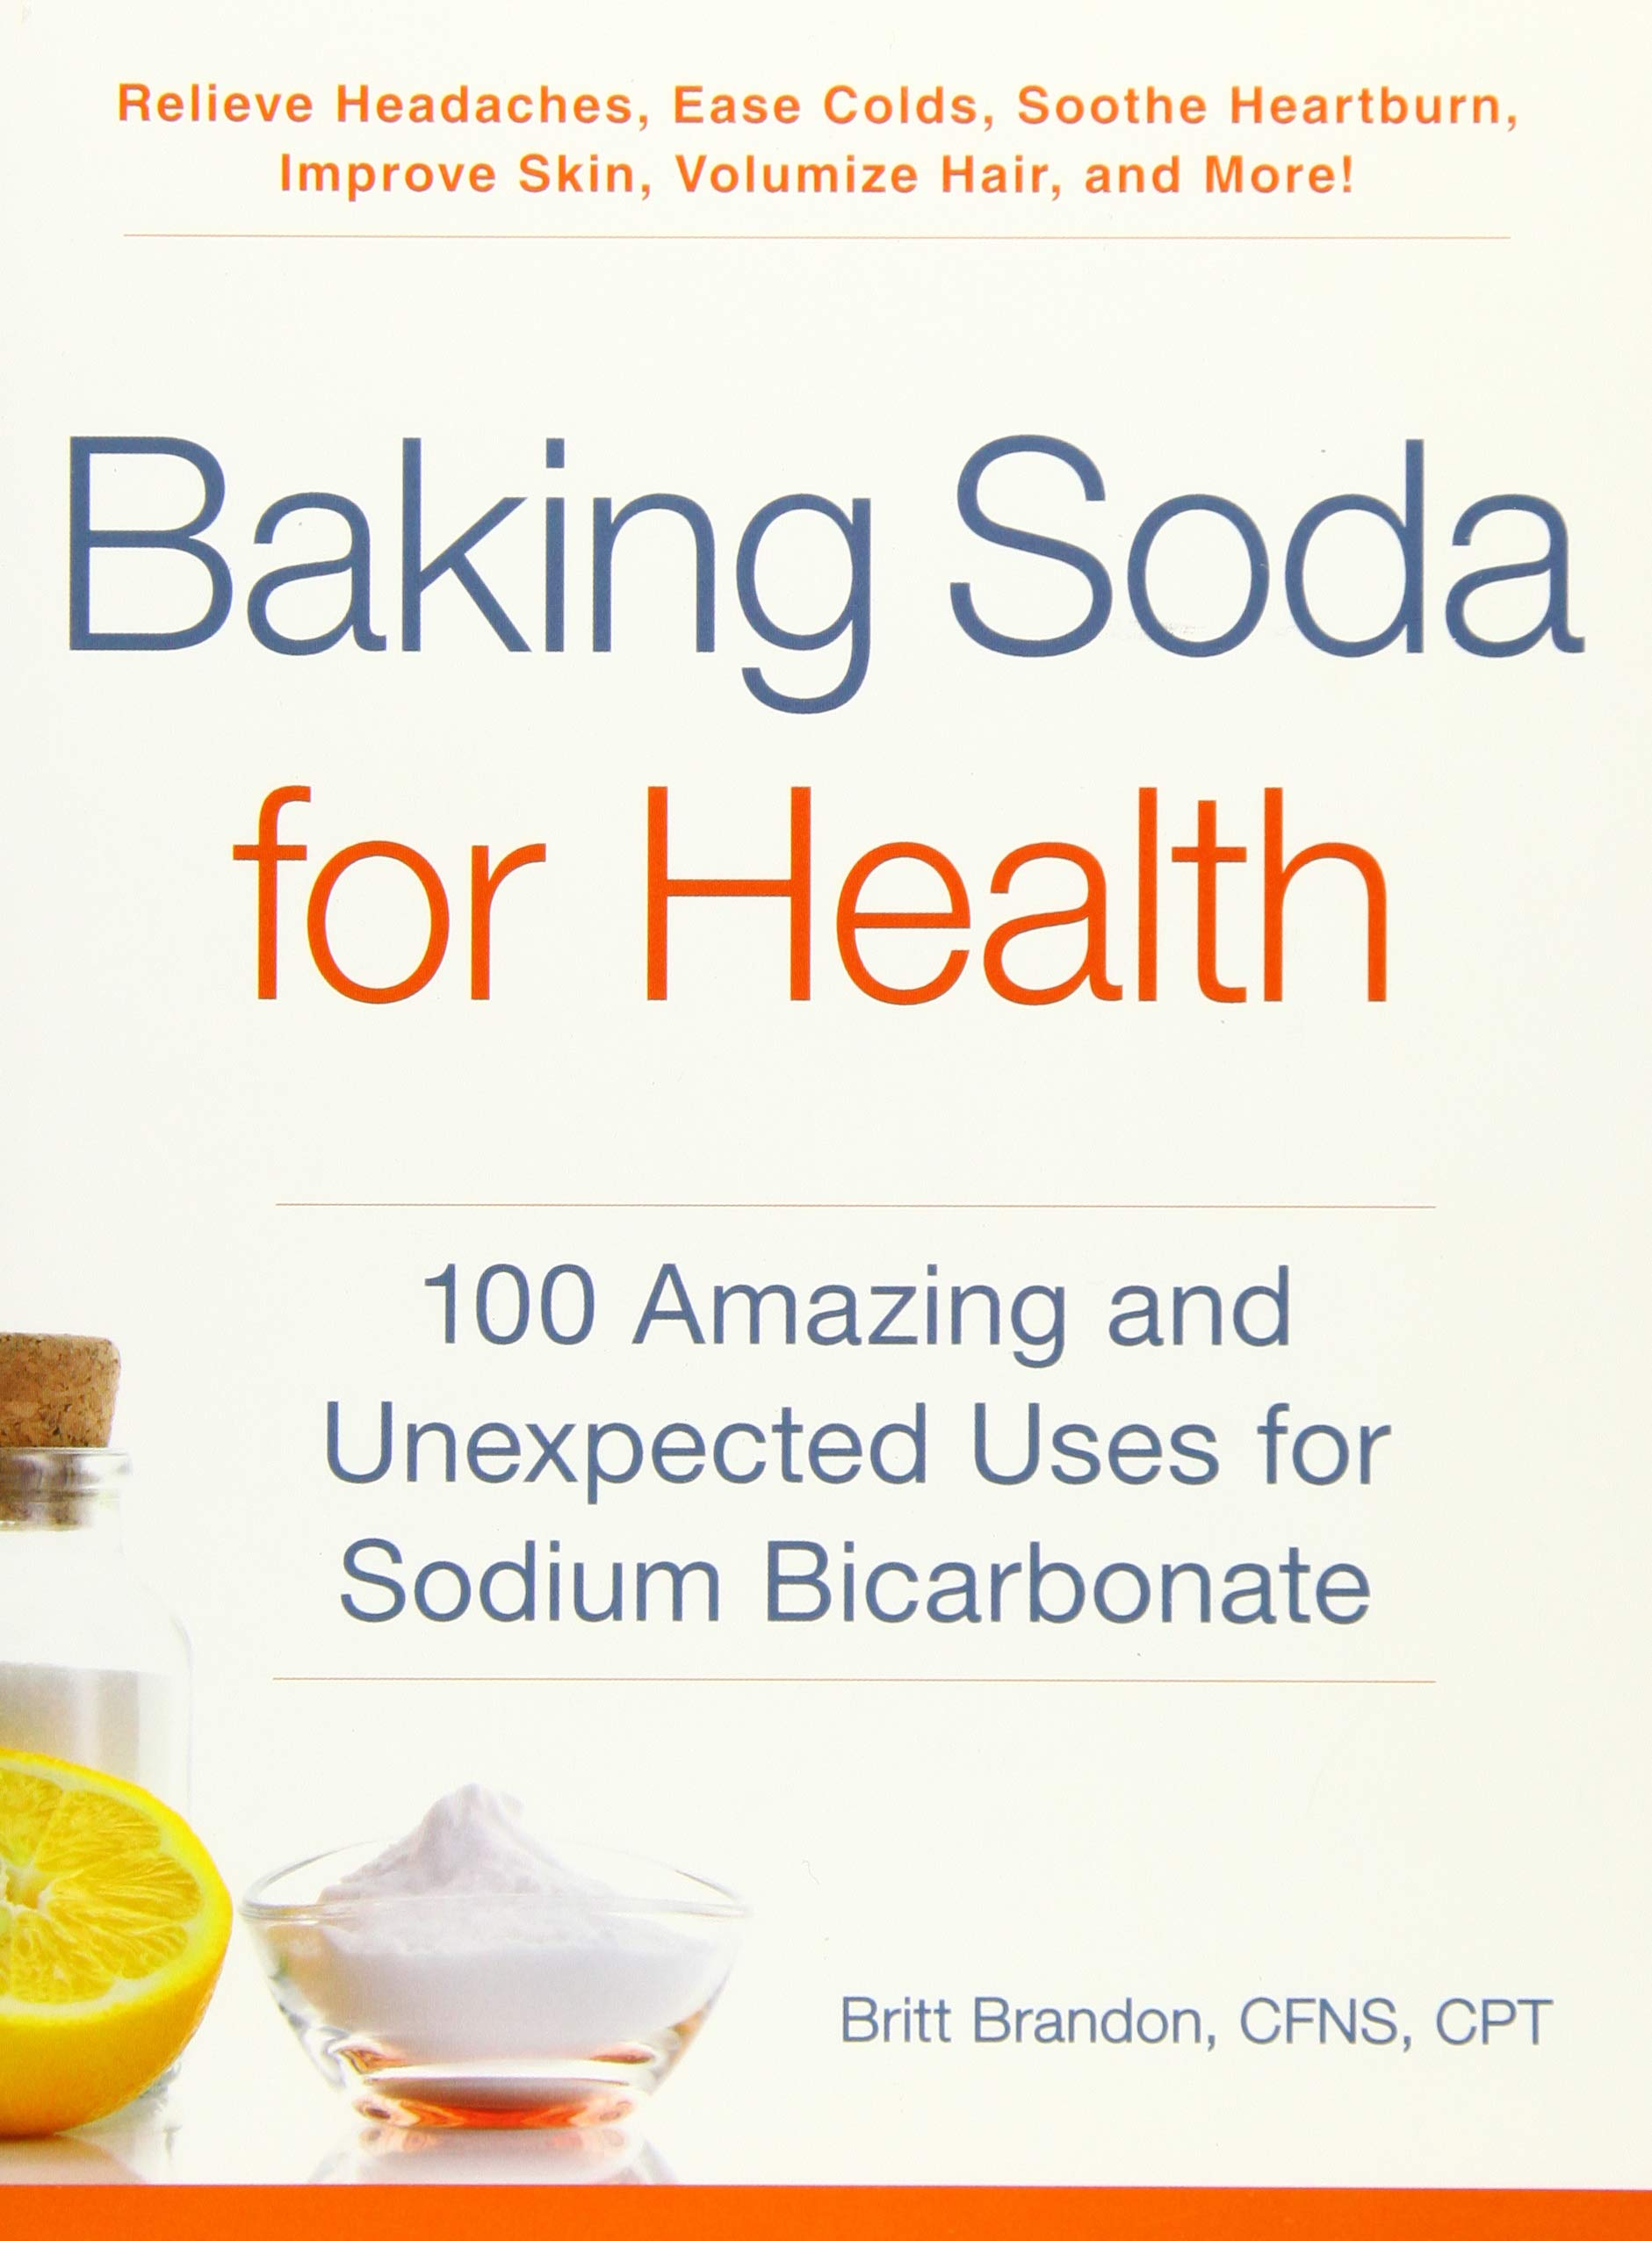 Baking Soda For Health 100 Amazing And Unexpected Uses For Sodium Bicarbonate Brandon Britt 9781507206577 Amazon Com Books